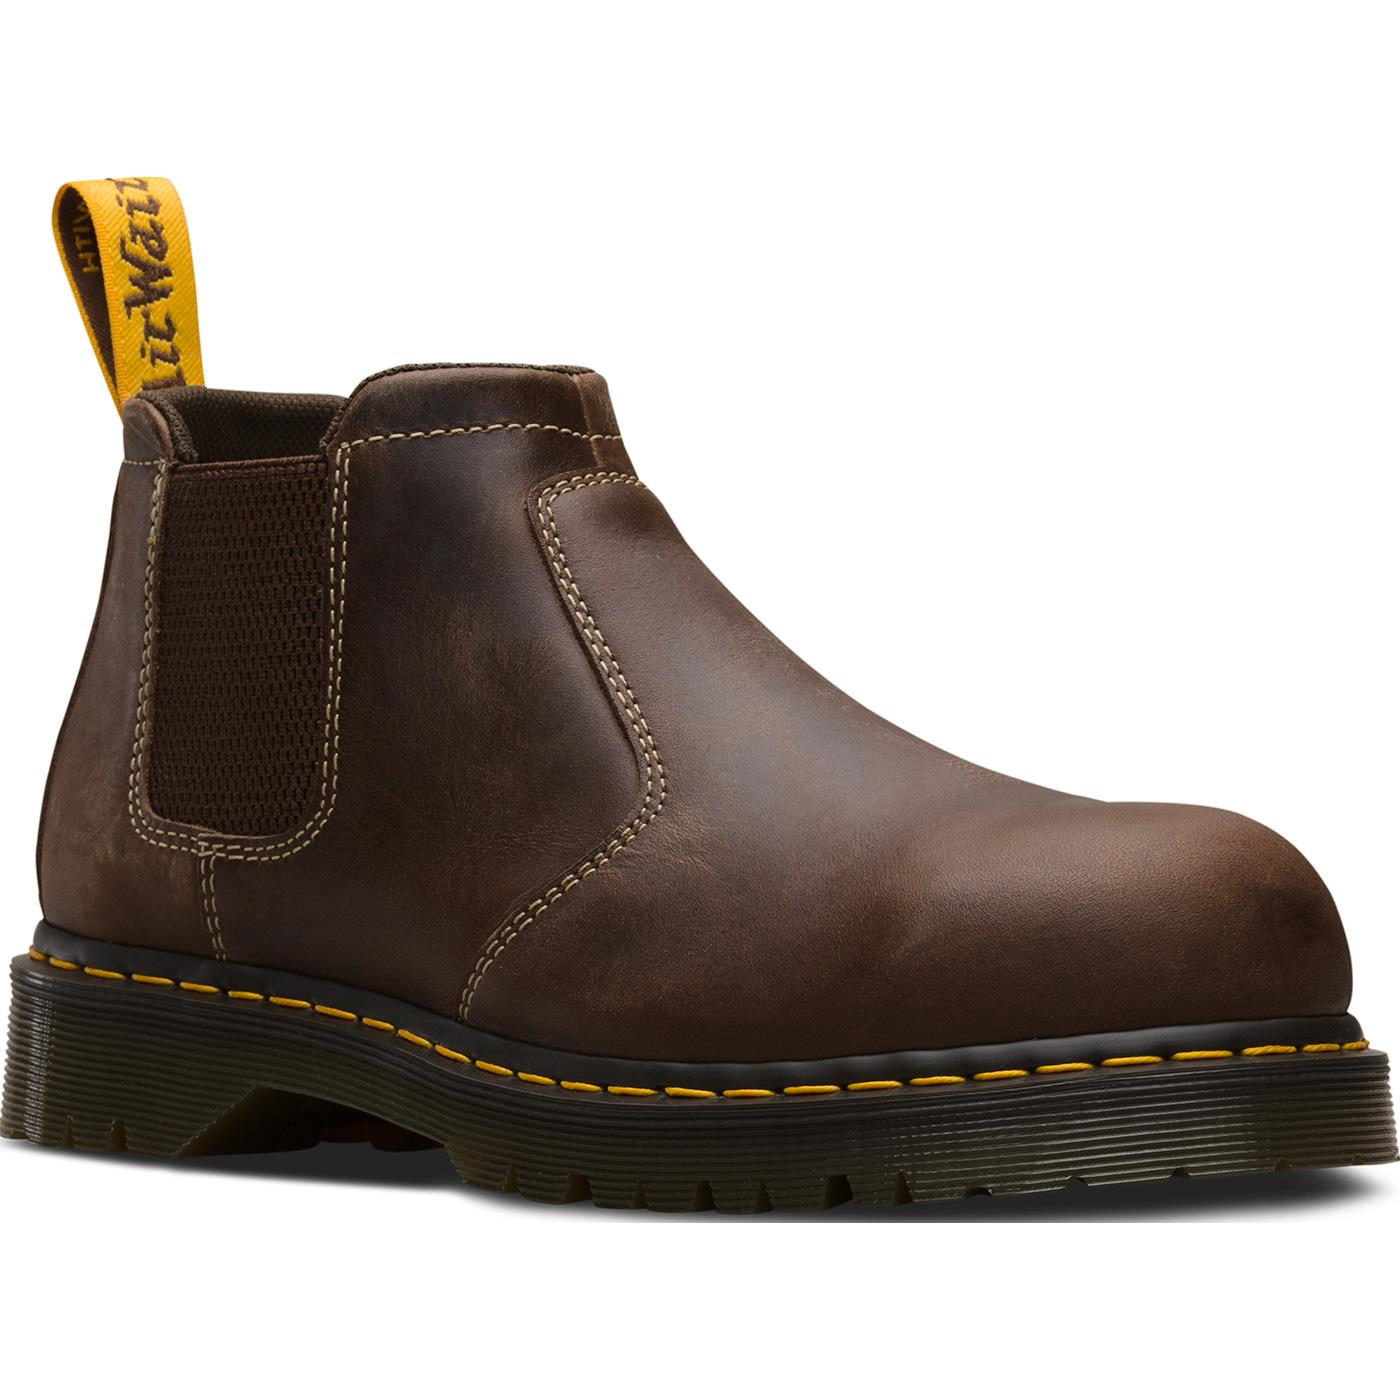 c61bef565eb Dr. Martens Heritage Furness Men's 5 inch Steel Electrical Hazard Romeo  Work Shoe